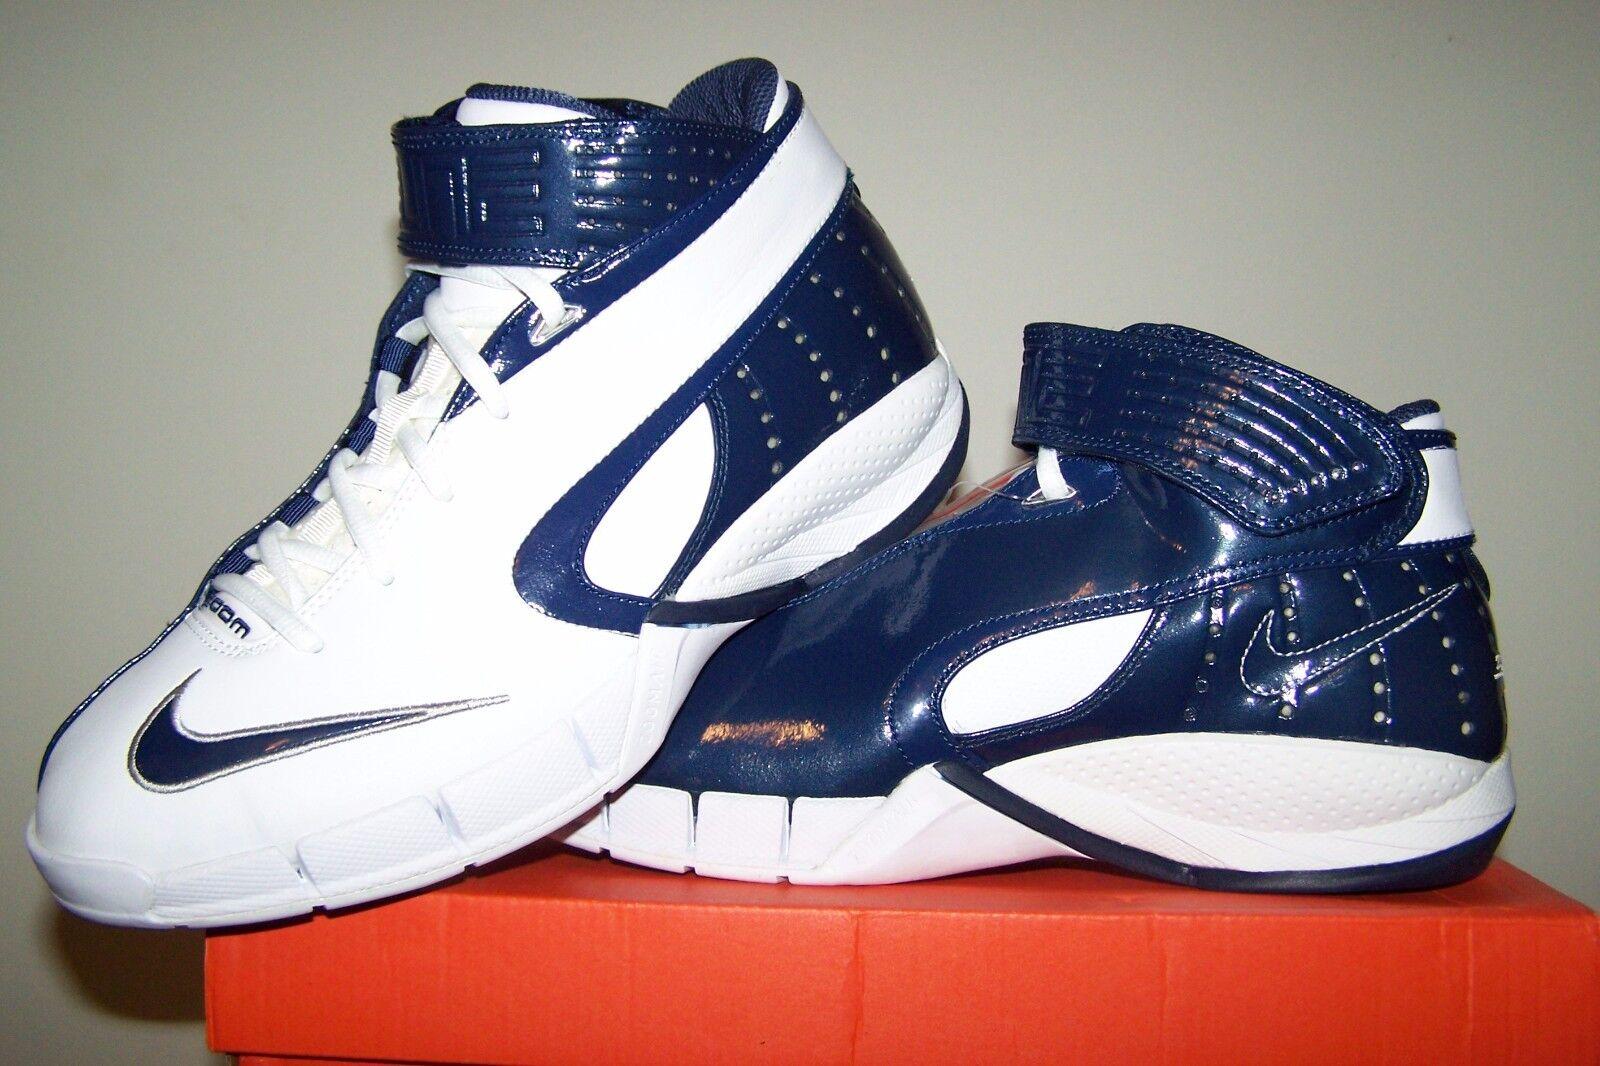 Women's size 10.5 M NEW Nike Wmns Zoom Huarache White Basketball Shoes